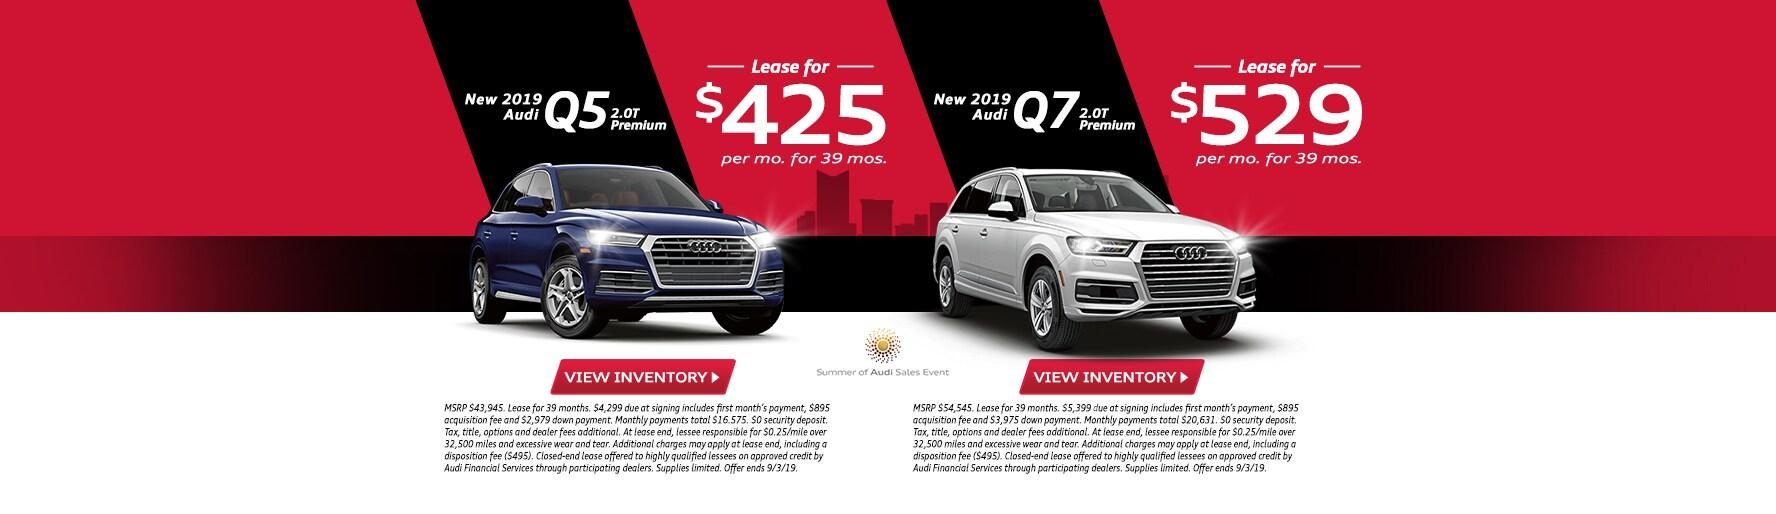 Audi Dealer Fort Worth TX | Audi Fort Worth